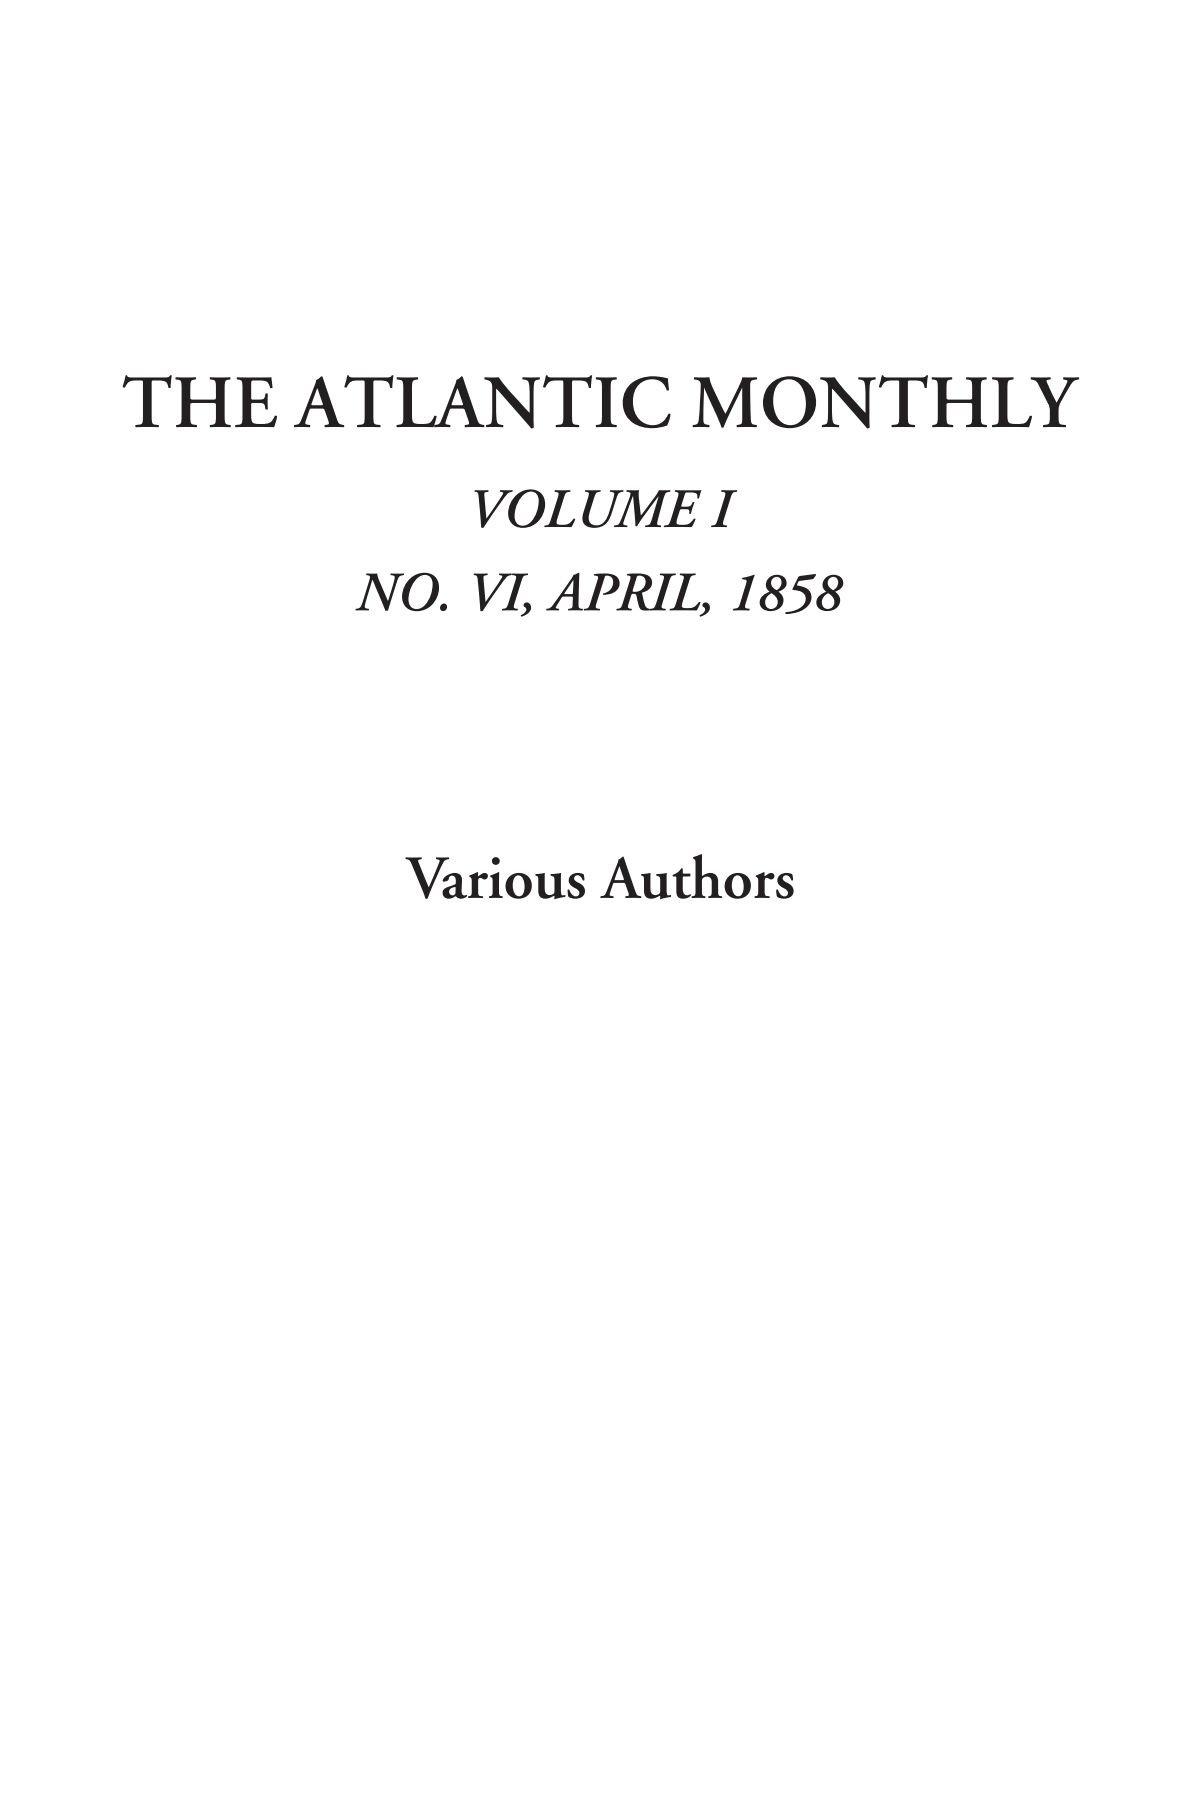 The Atlantic Monthly (Volume I, No. VI, April, 1858) pdf